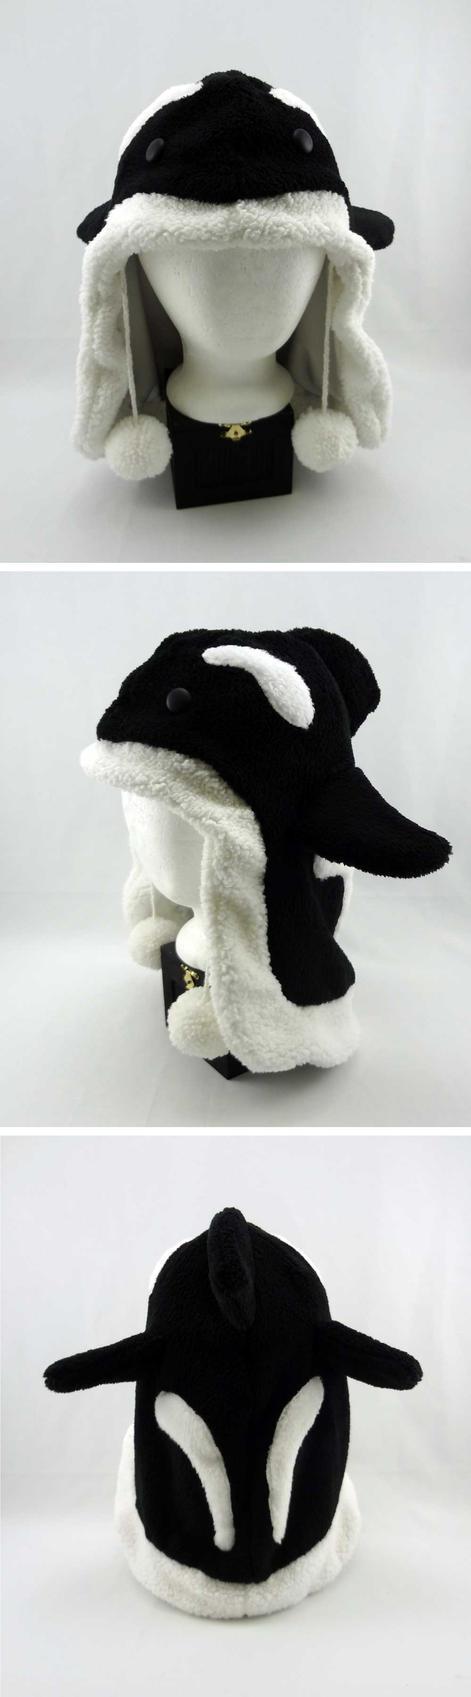 Custom quaggan hat by Koreena